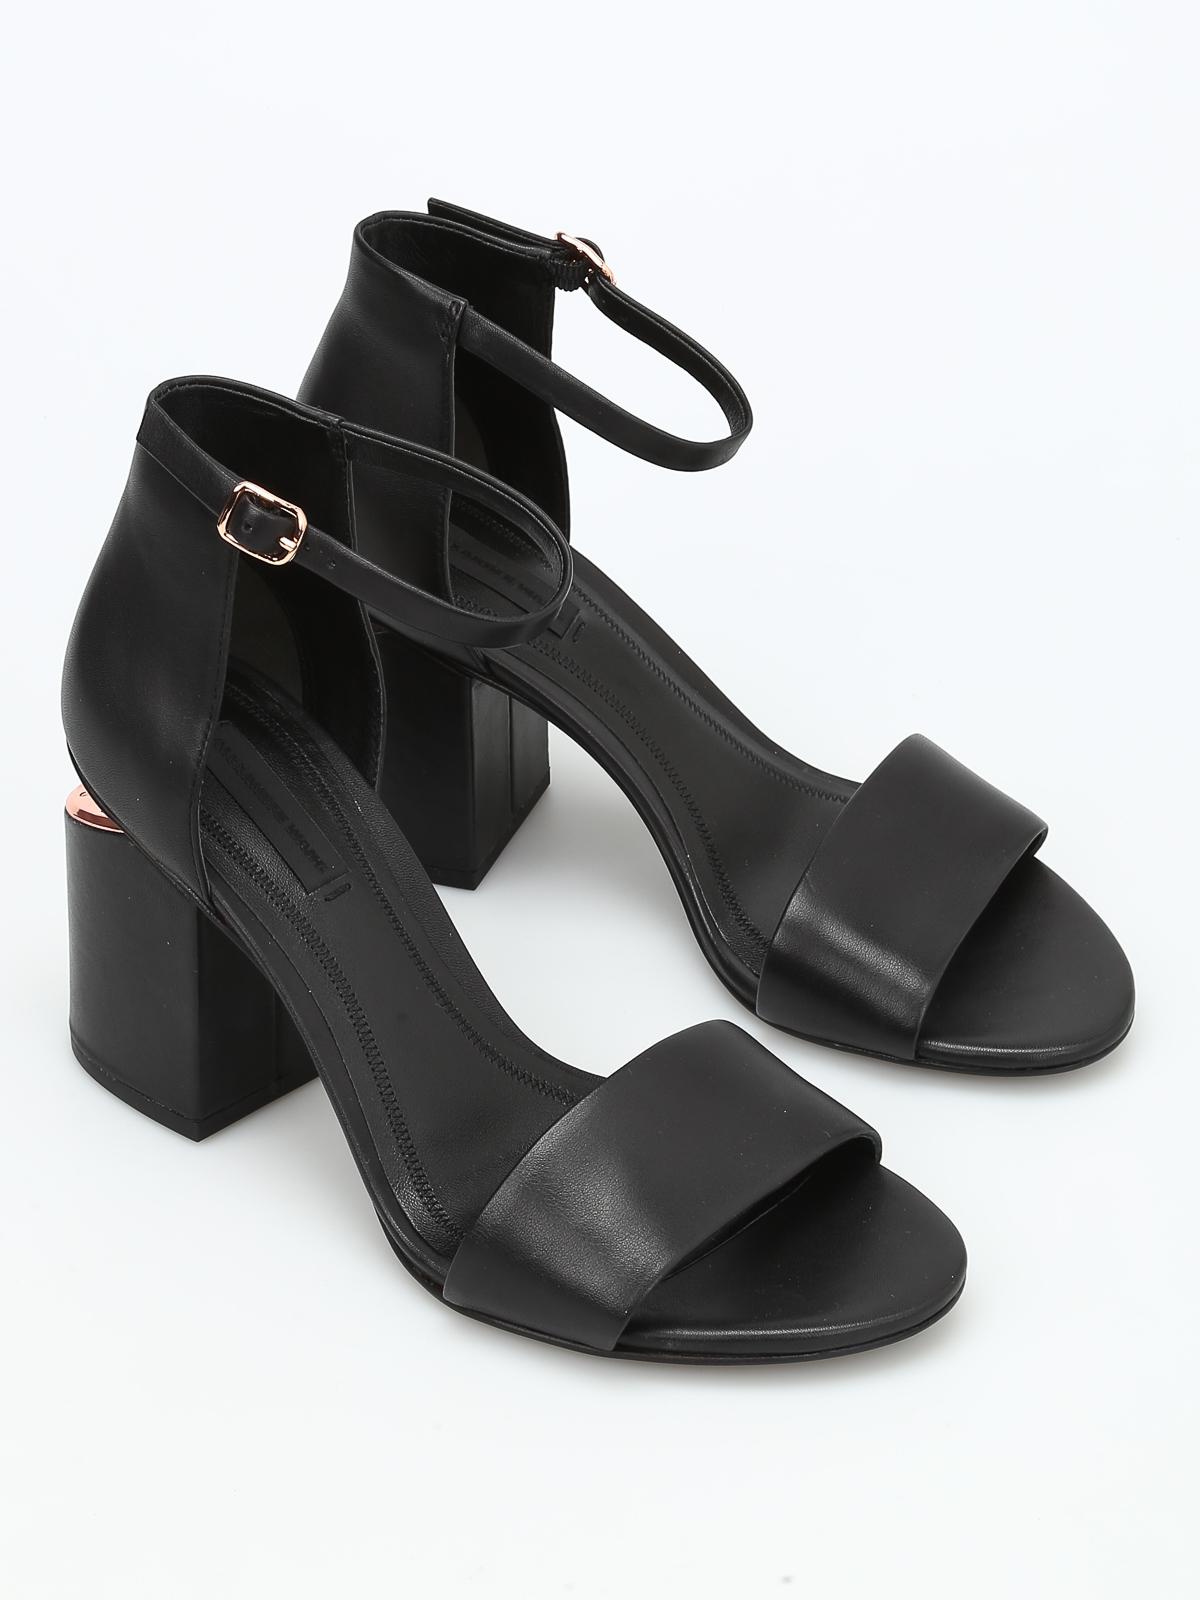 56202364cd1e Alexander Wang - Abby leather sandals - sandals - 304140001